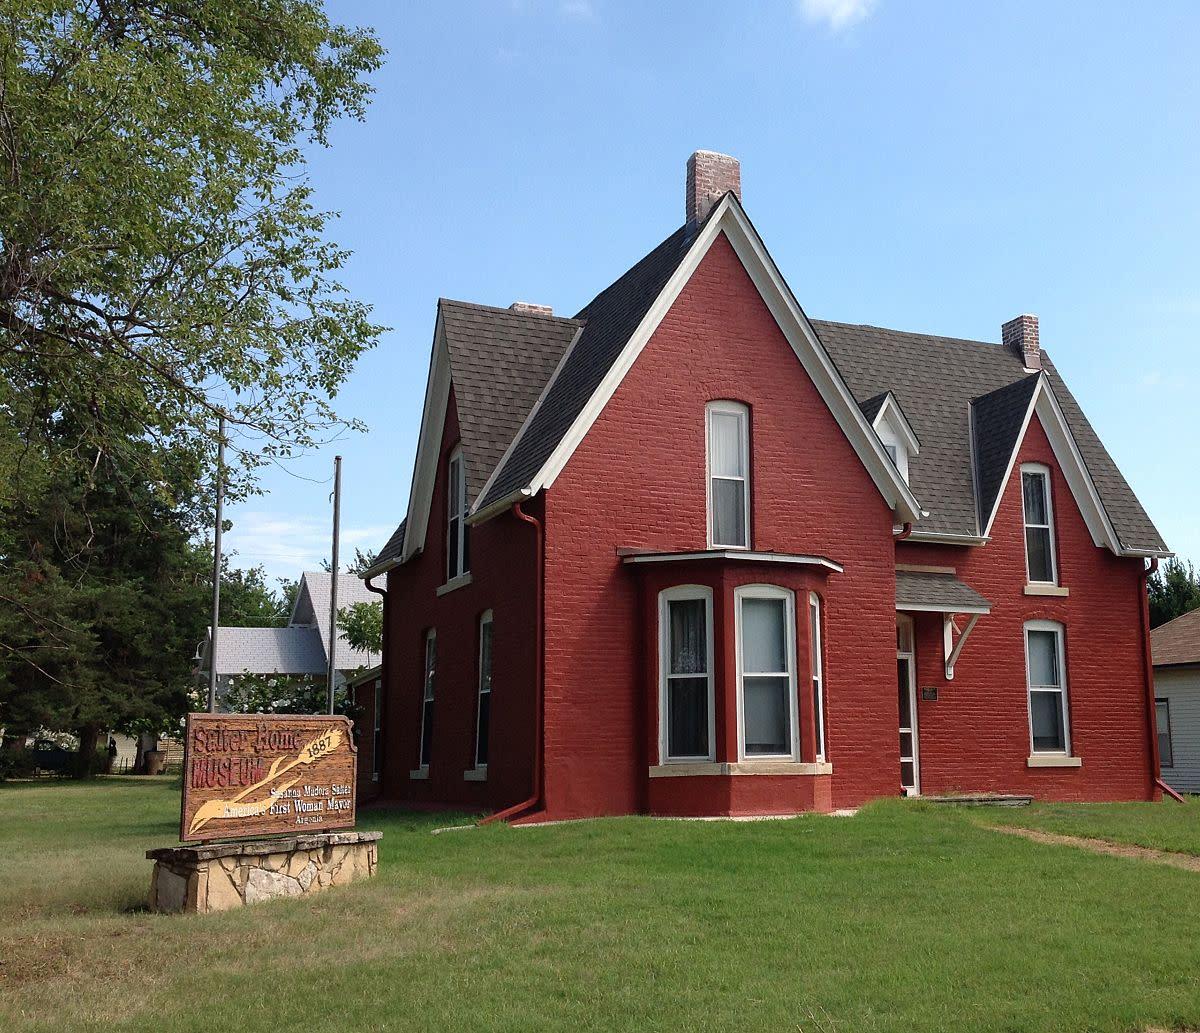 Salter family home in Argonia, Kansas